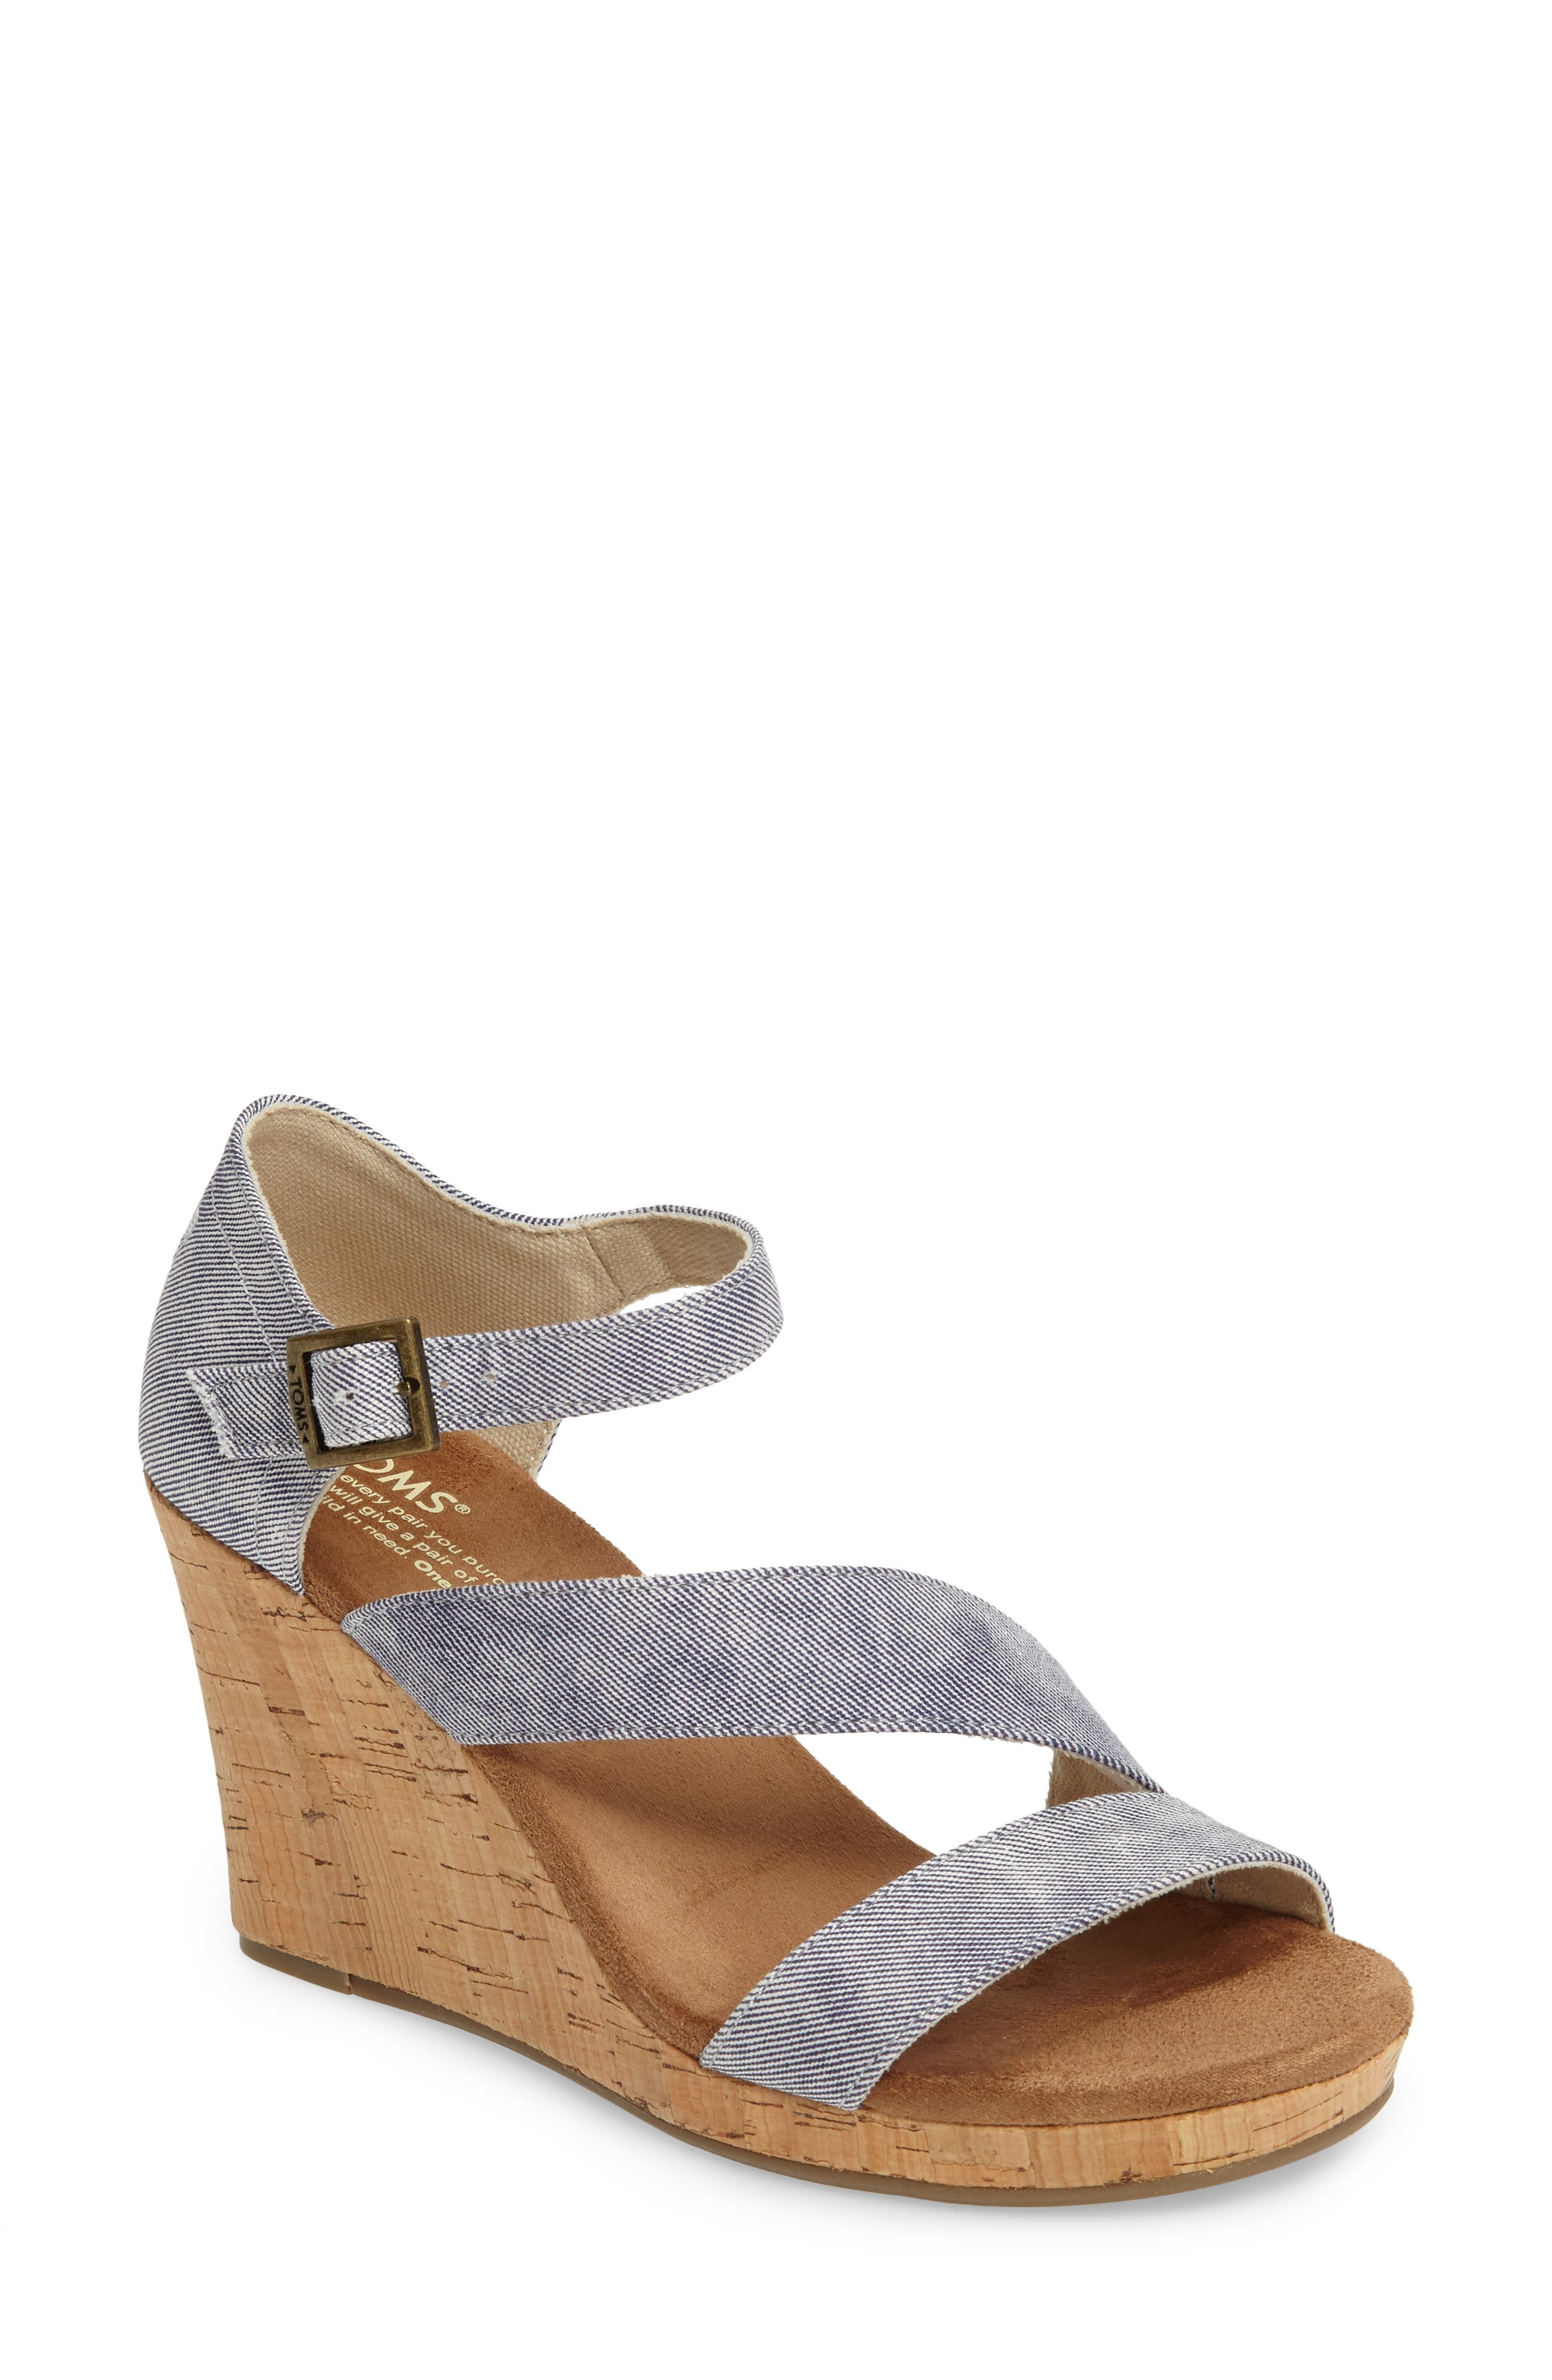 Clarissa Wedge Sandal,                         Main,                         color,